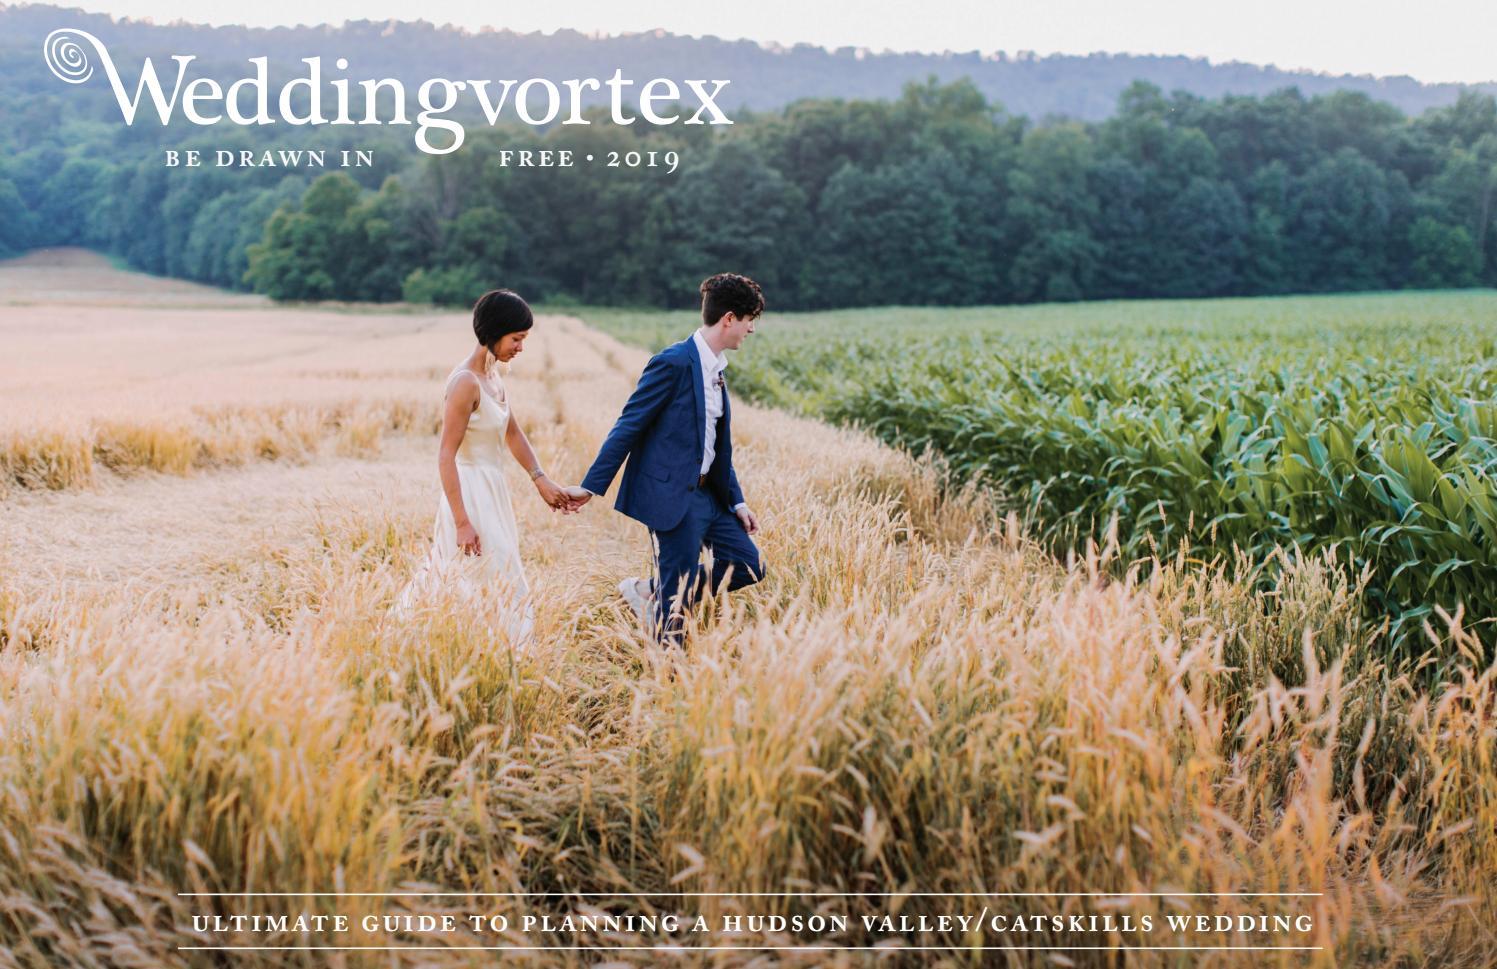 Weddingvortex 2019 Guide To Hudson Valley Catskills Weddings By